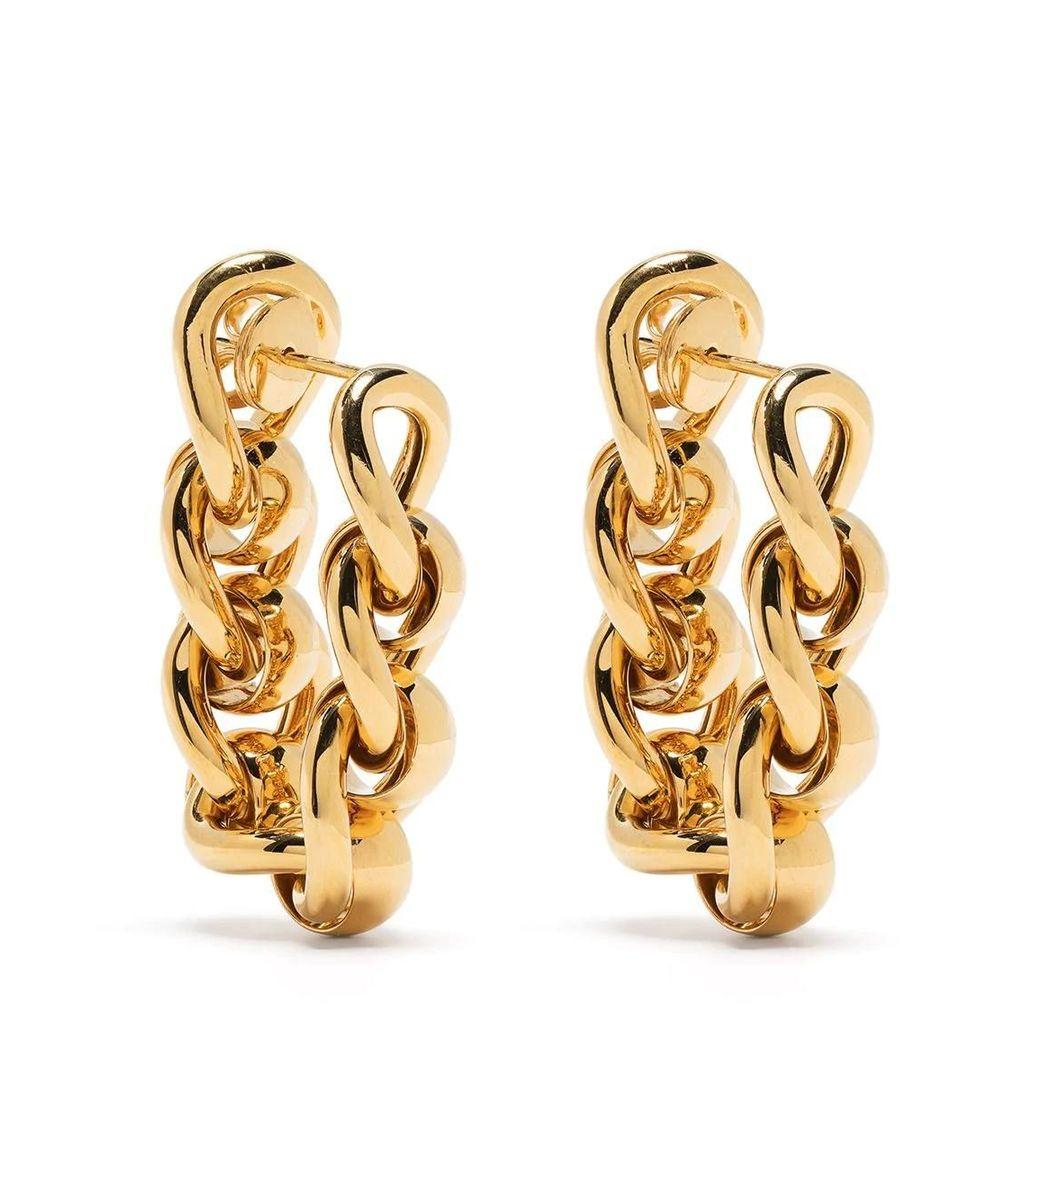 BOTTEGA VENETA Gold-tone Chain Link Hoop Earrings